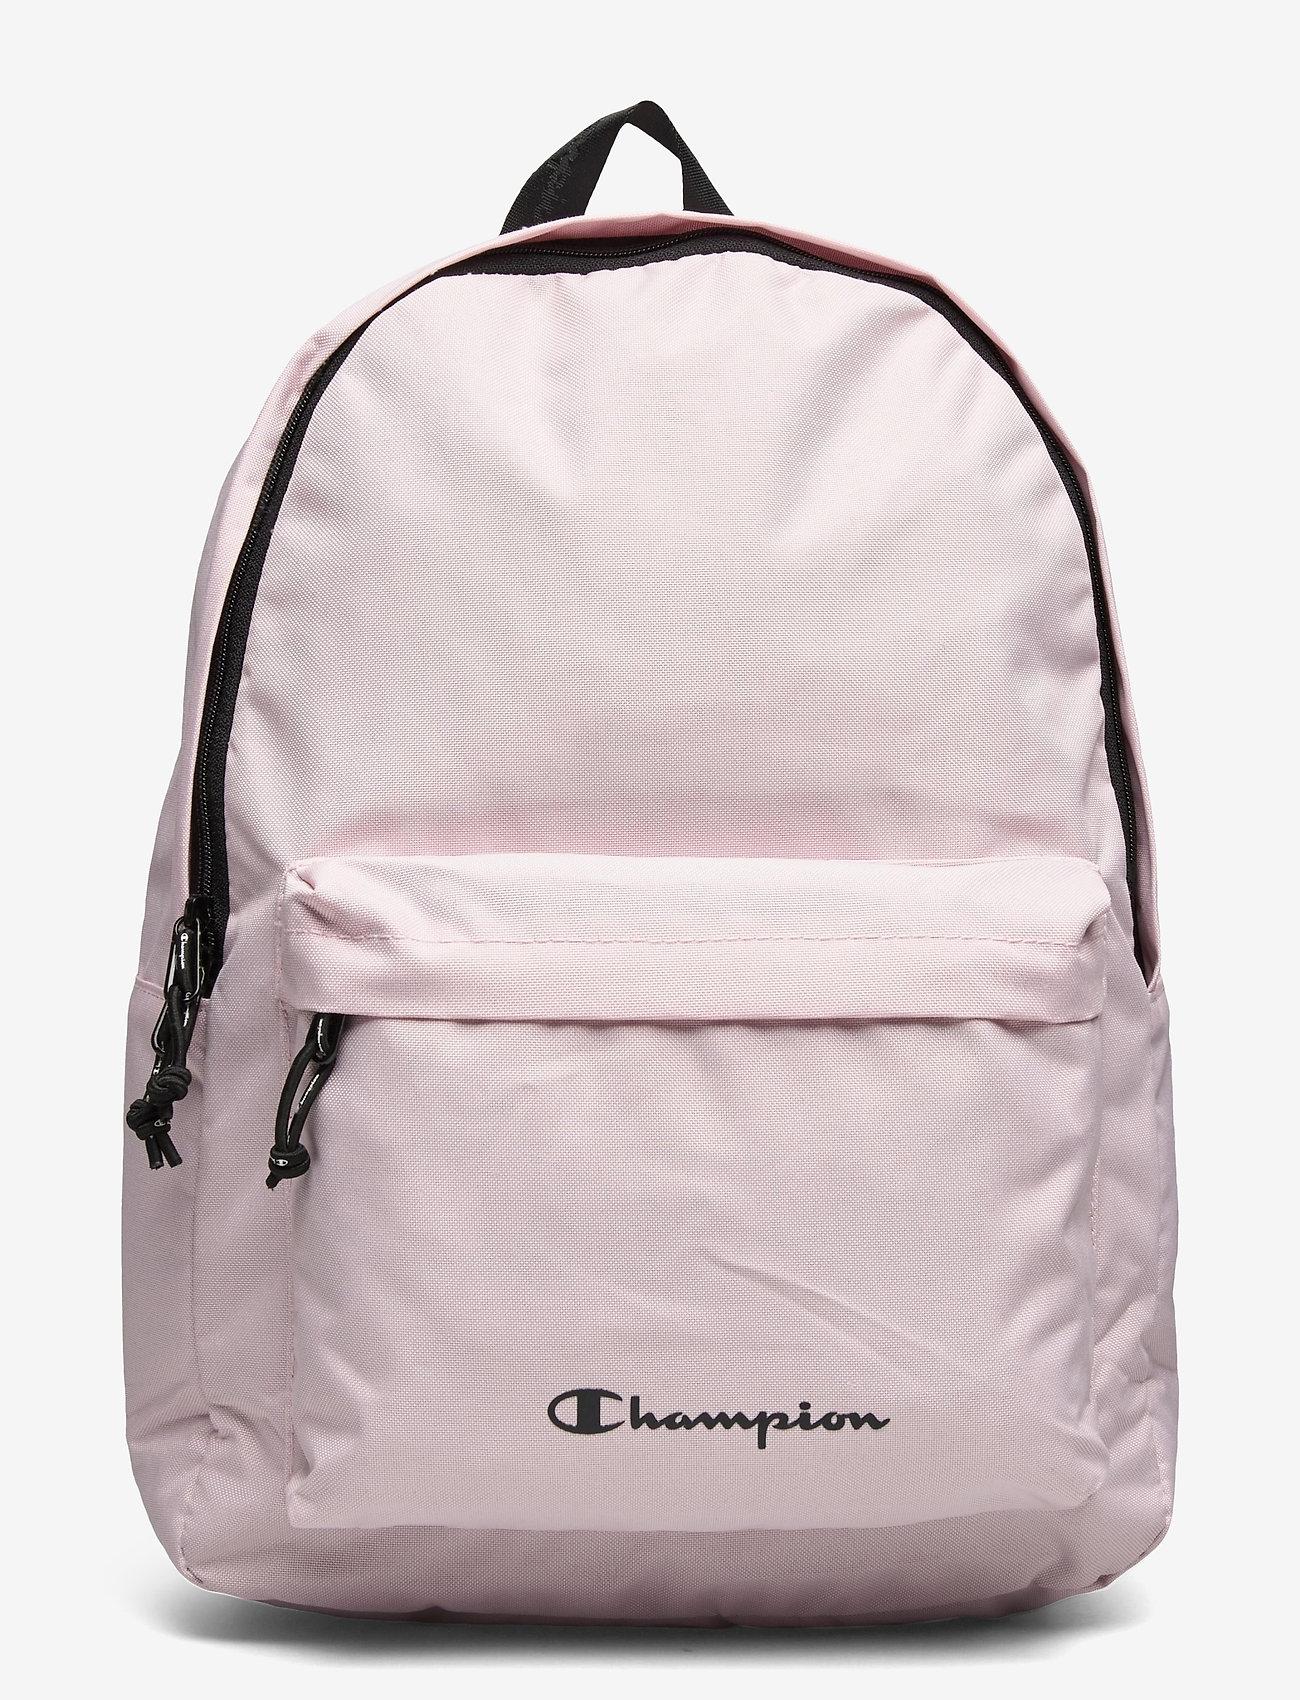 Champion - Backpack - trainingstassen - parfait pink - 0